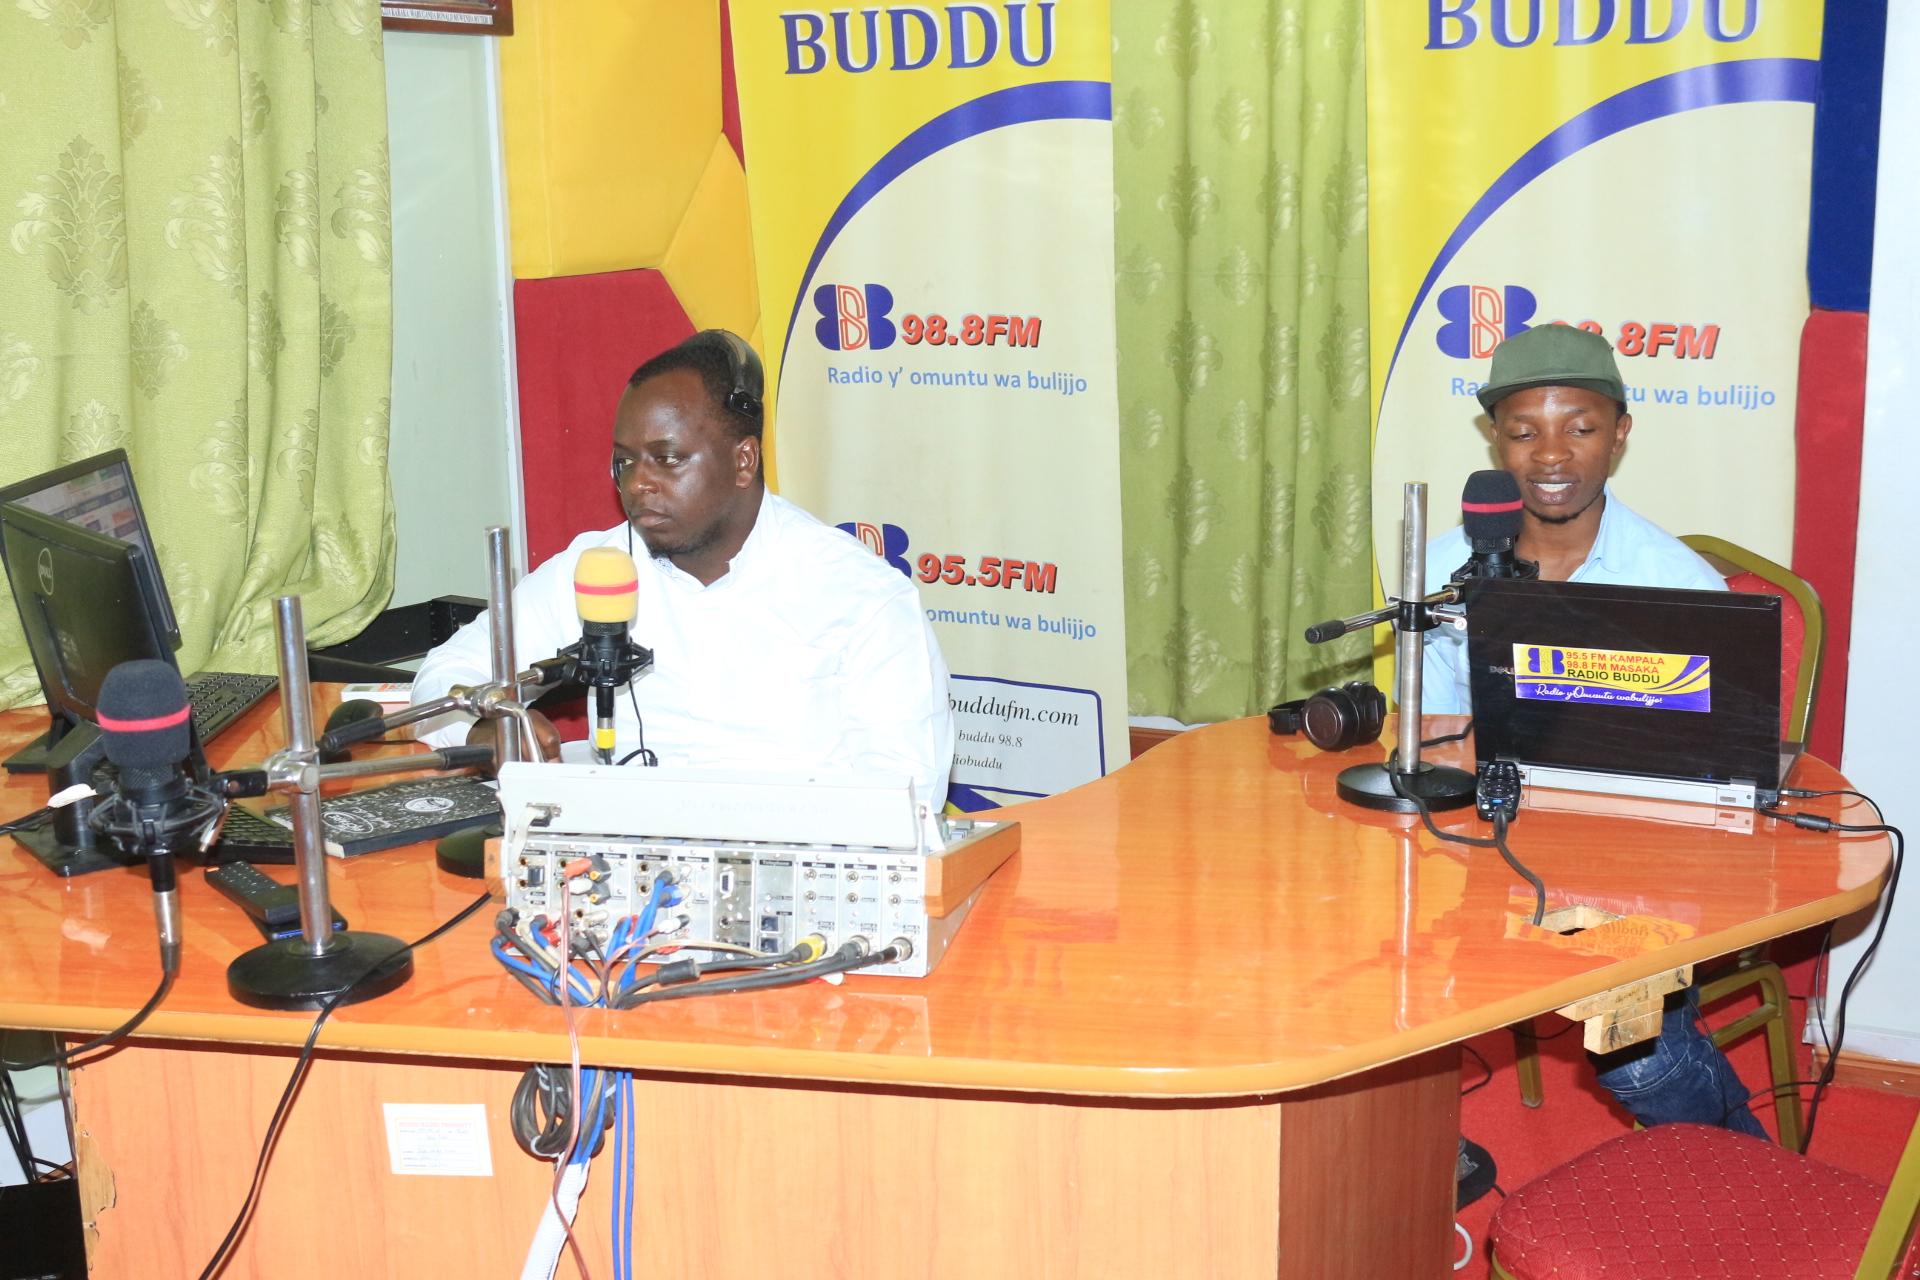 Tamukedde Umar & Ronald Jjuuko  Programme Tuula Tukenkuke